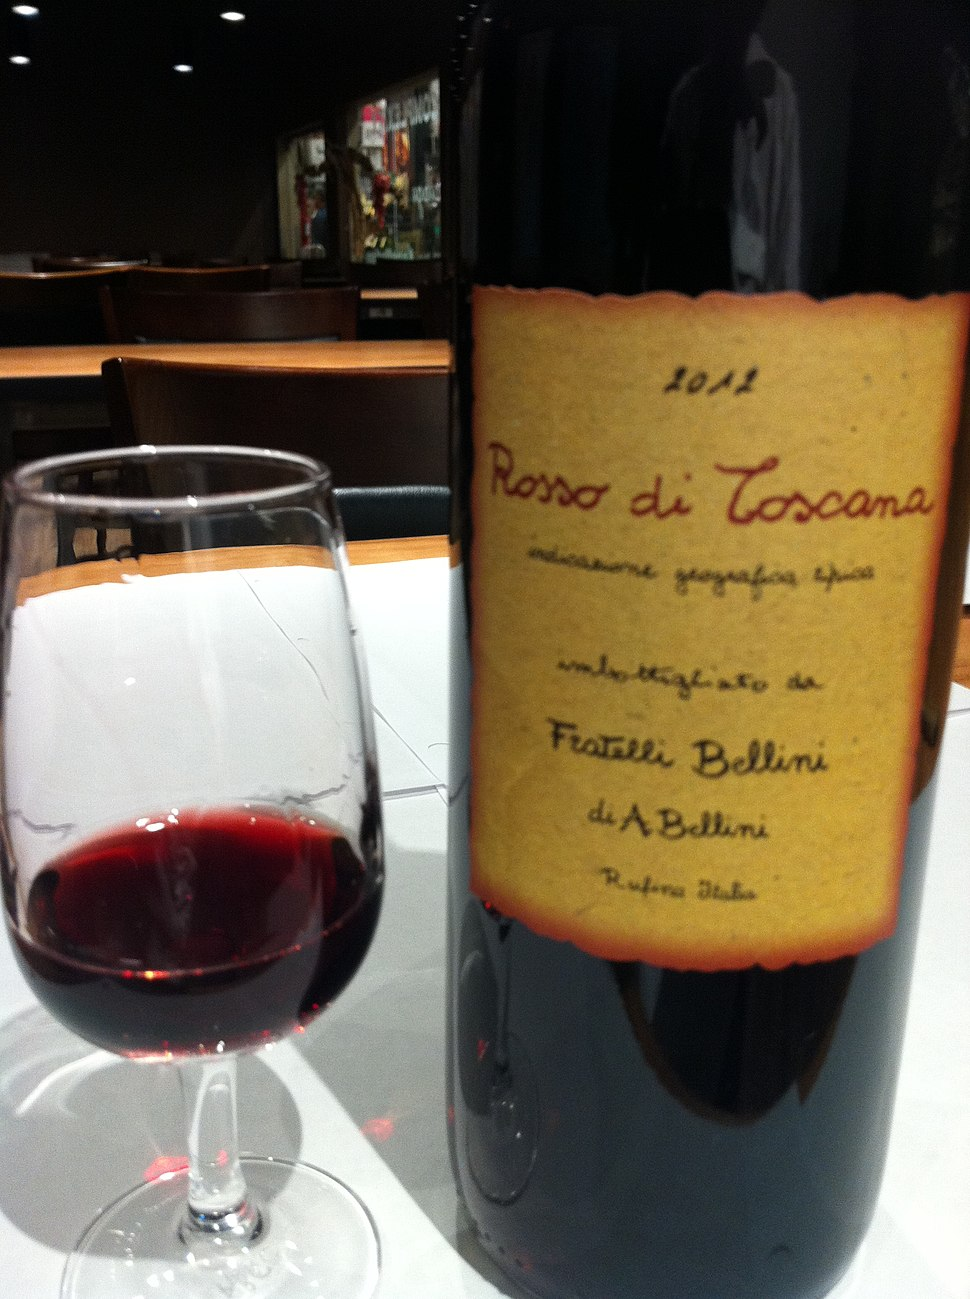 Toscana igt wine